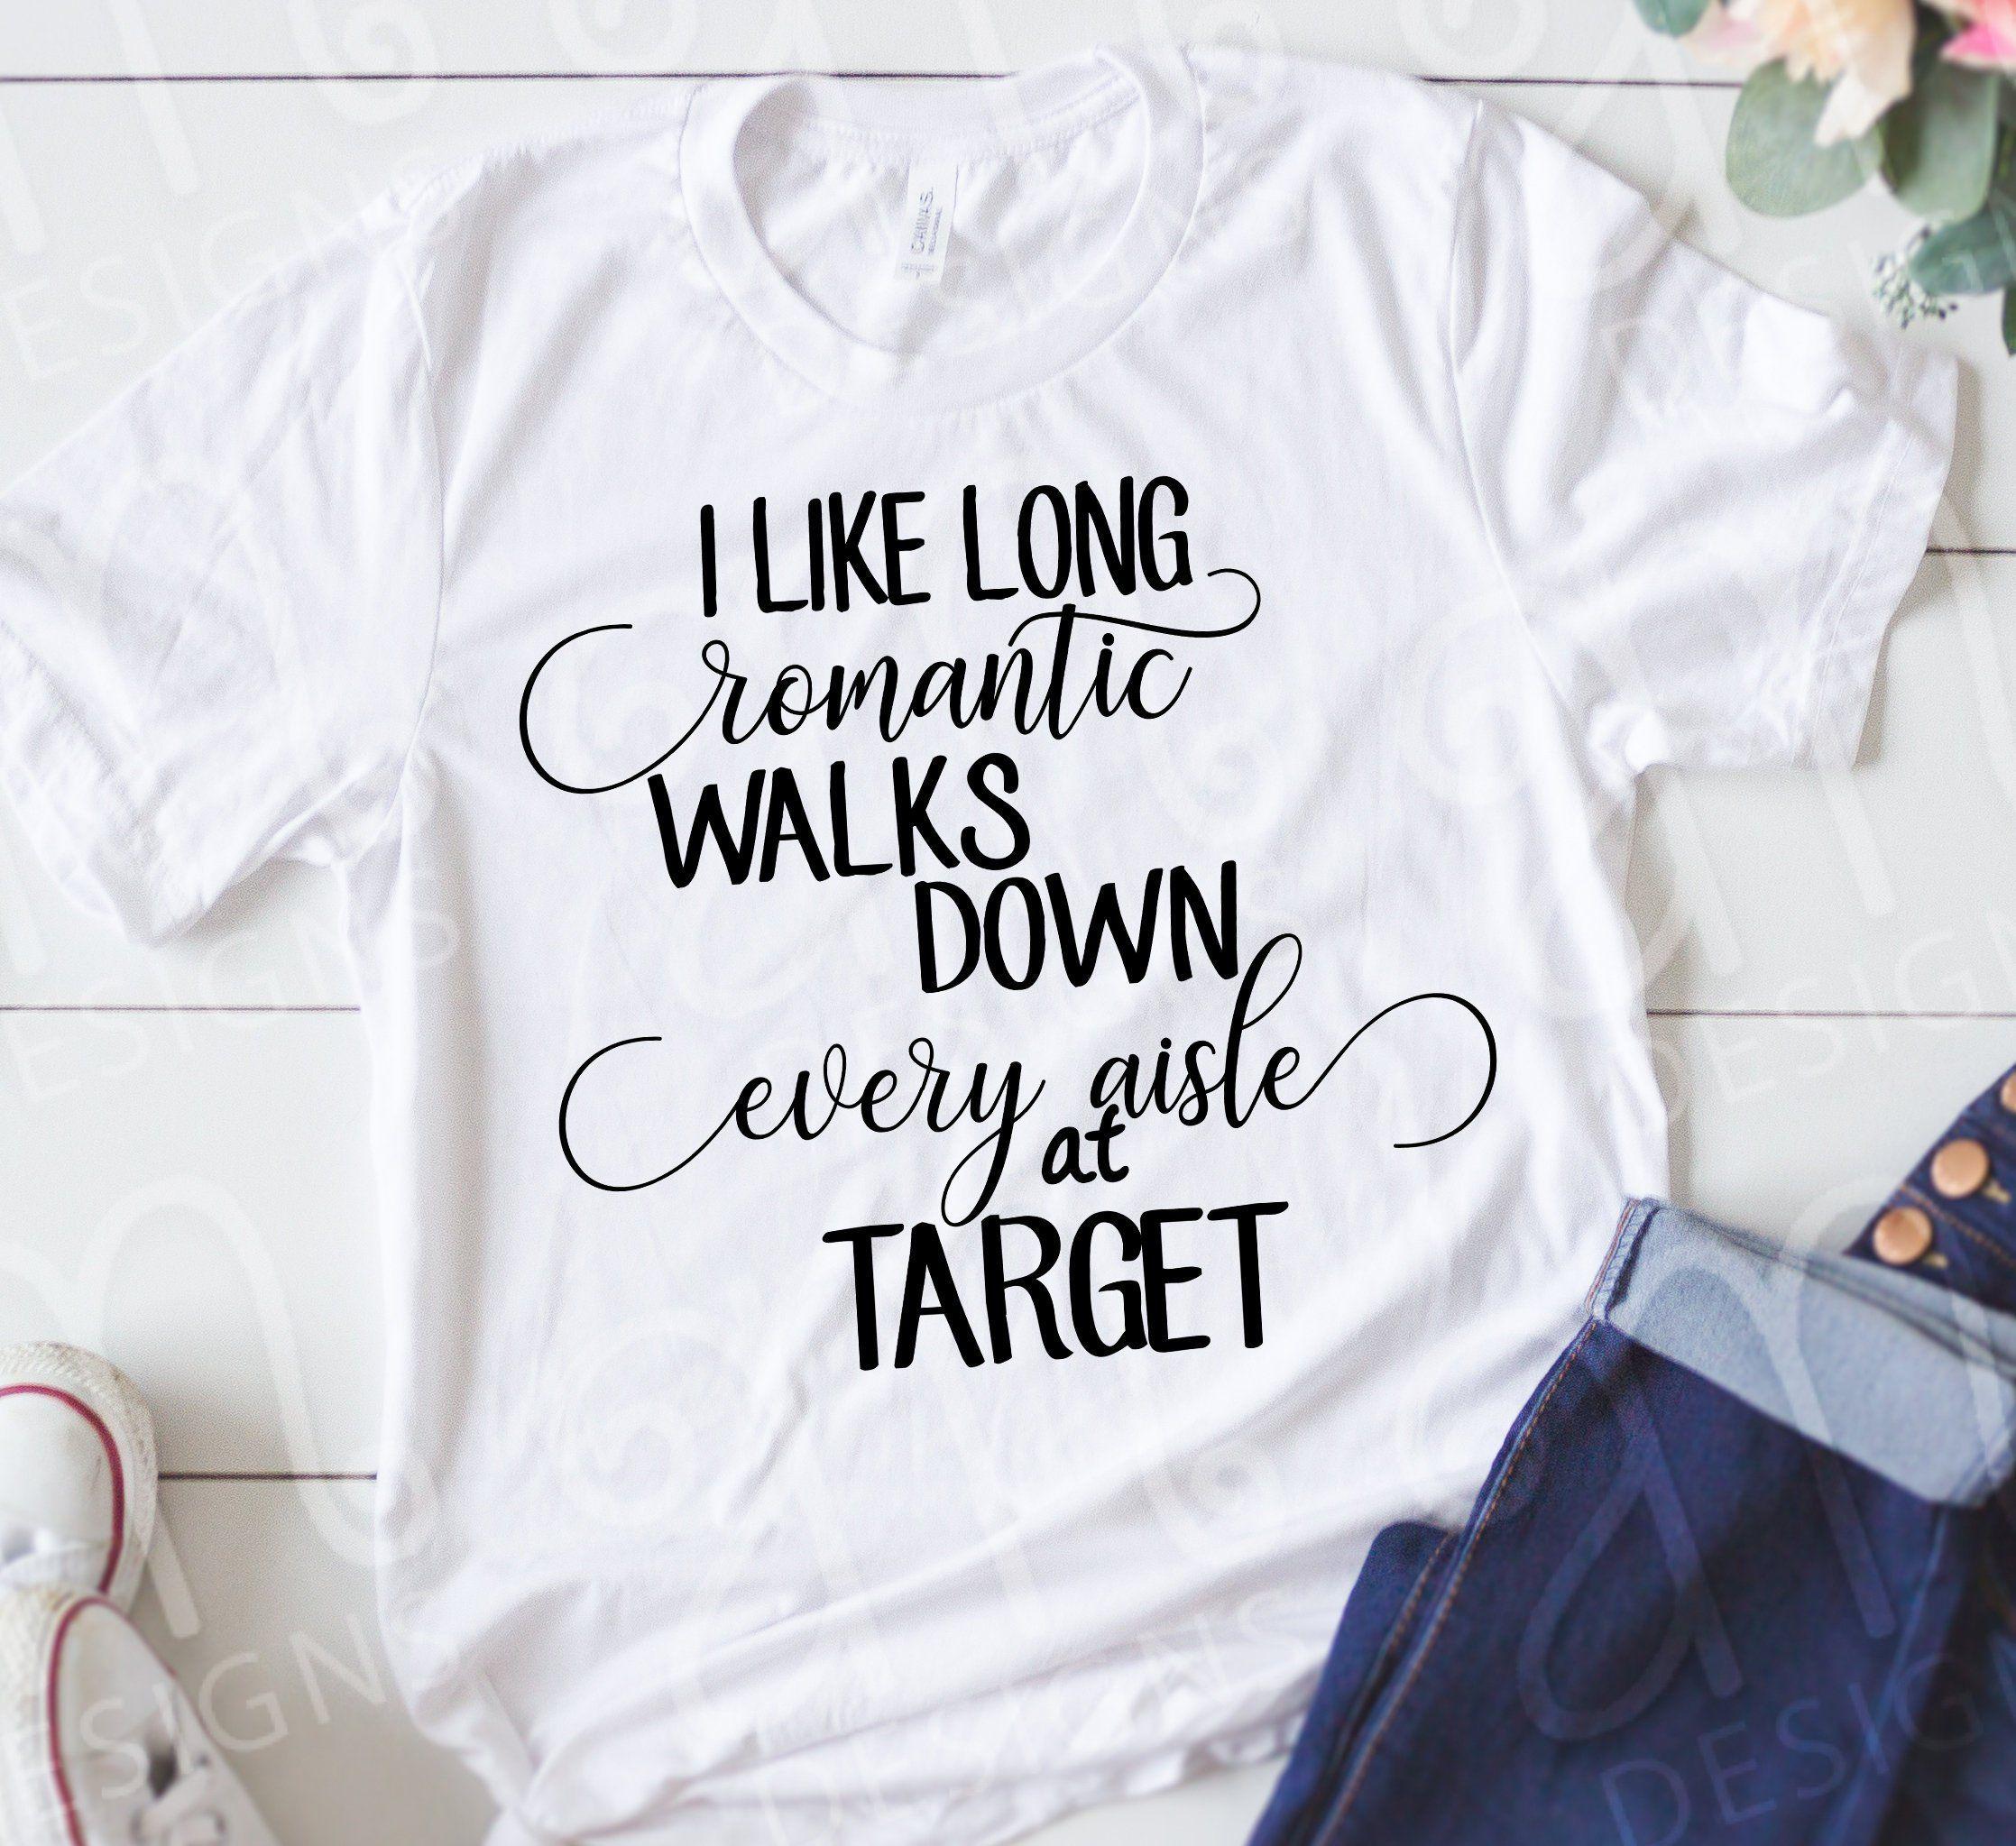 Svg Svg Designs Funny Sayings Svg Svg Sayings Target Svg For Her Svg Romantic Walks Every Aisle Tar Funny Shirt Sayings Shirts With Sayings Funny Shirts